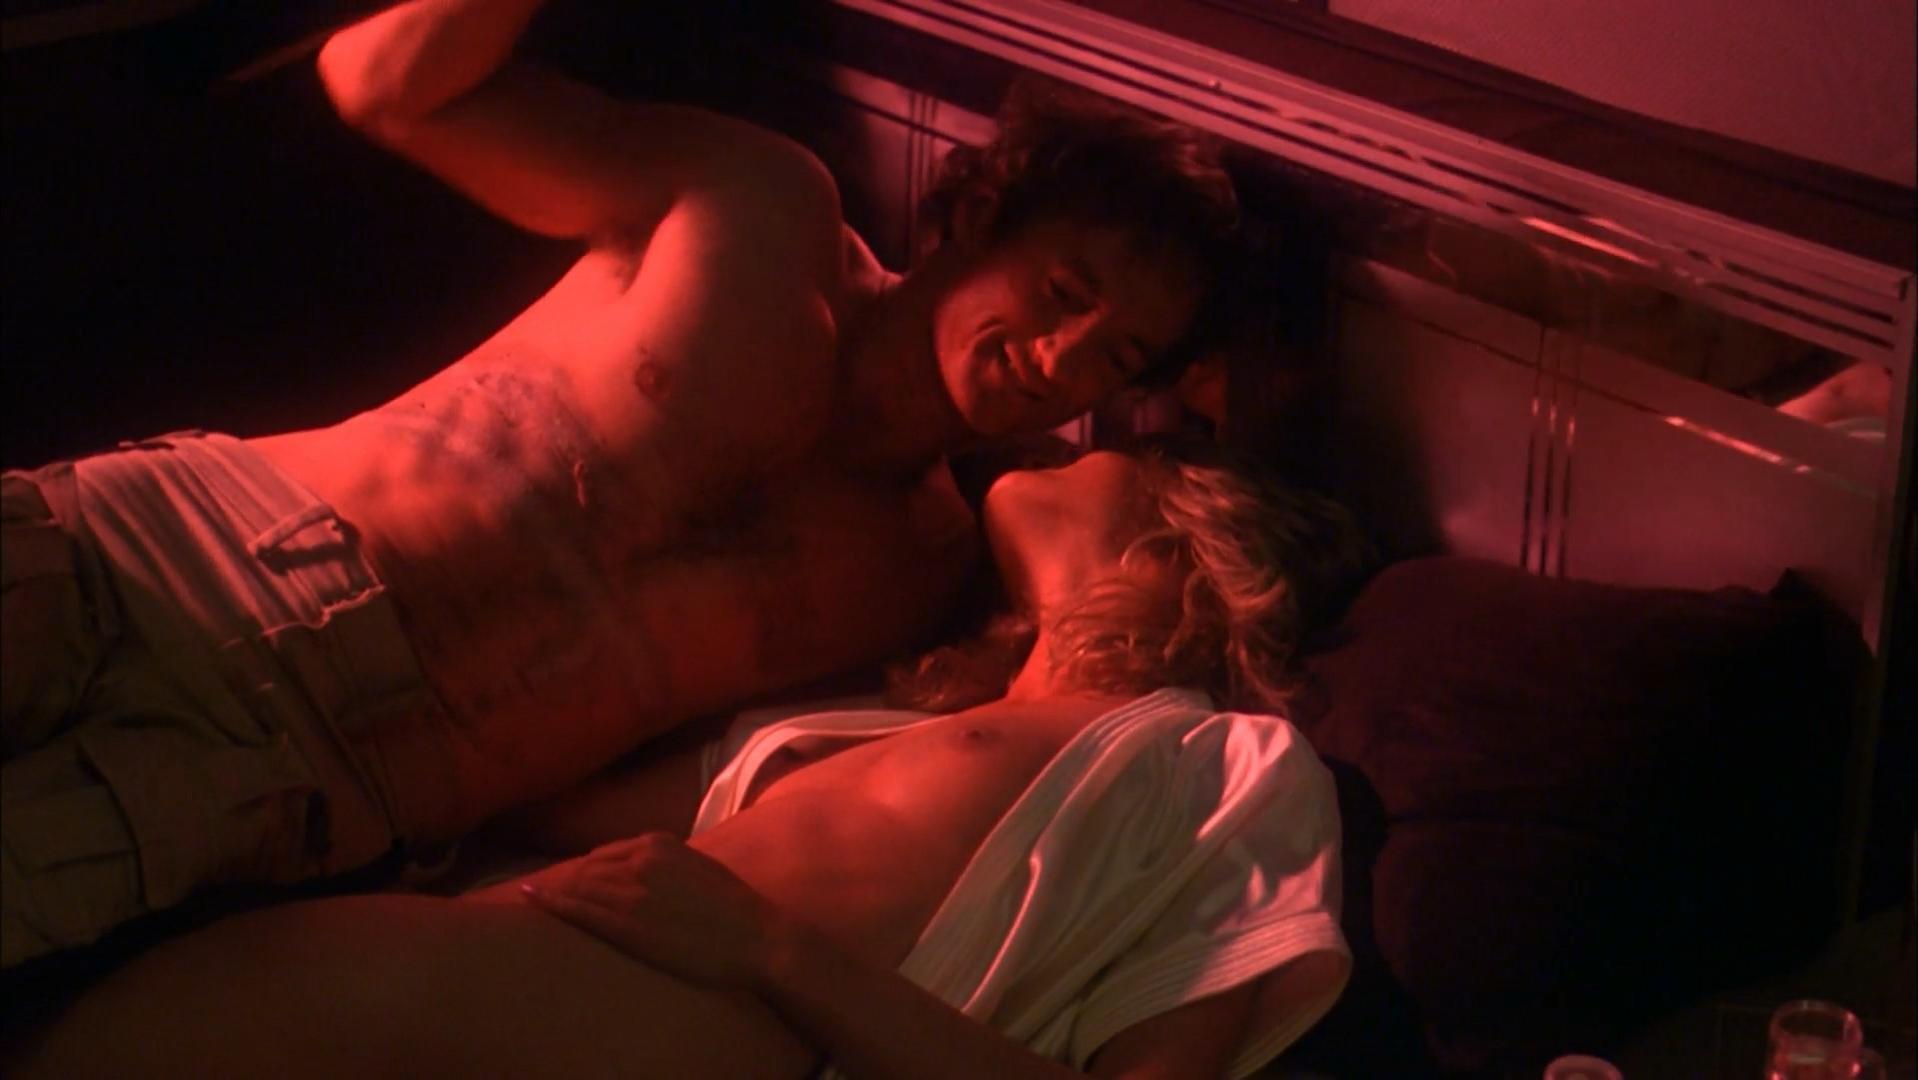 June Chadwick nude, Dawn Dunlap nude - Forbidden World (1982)